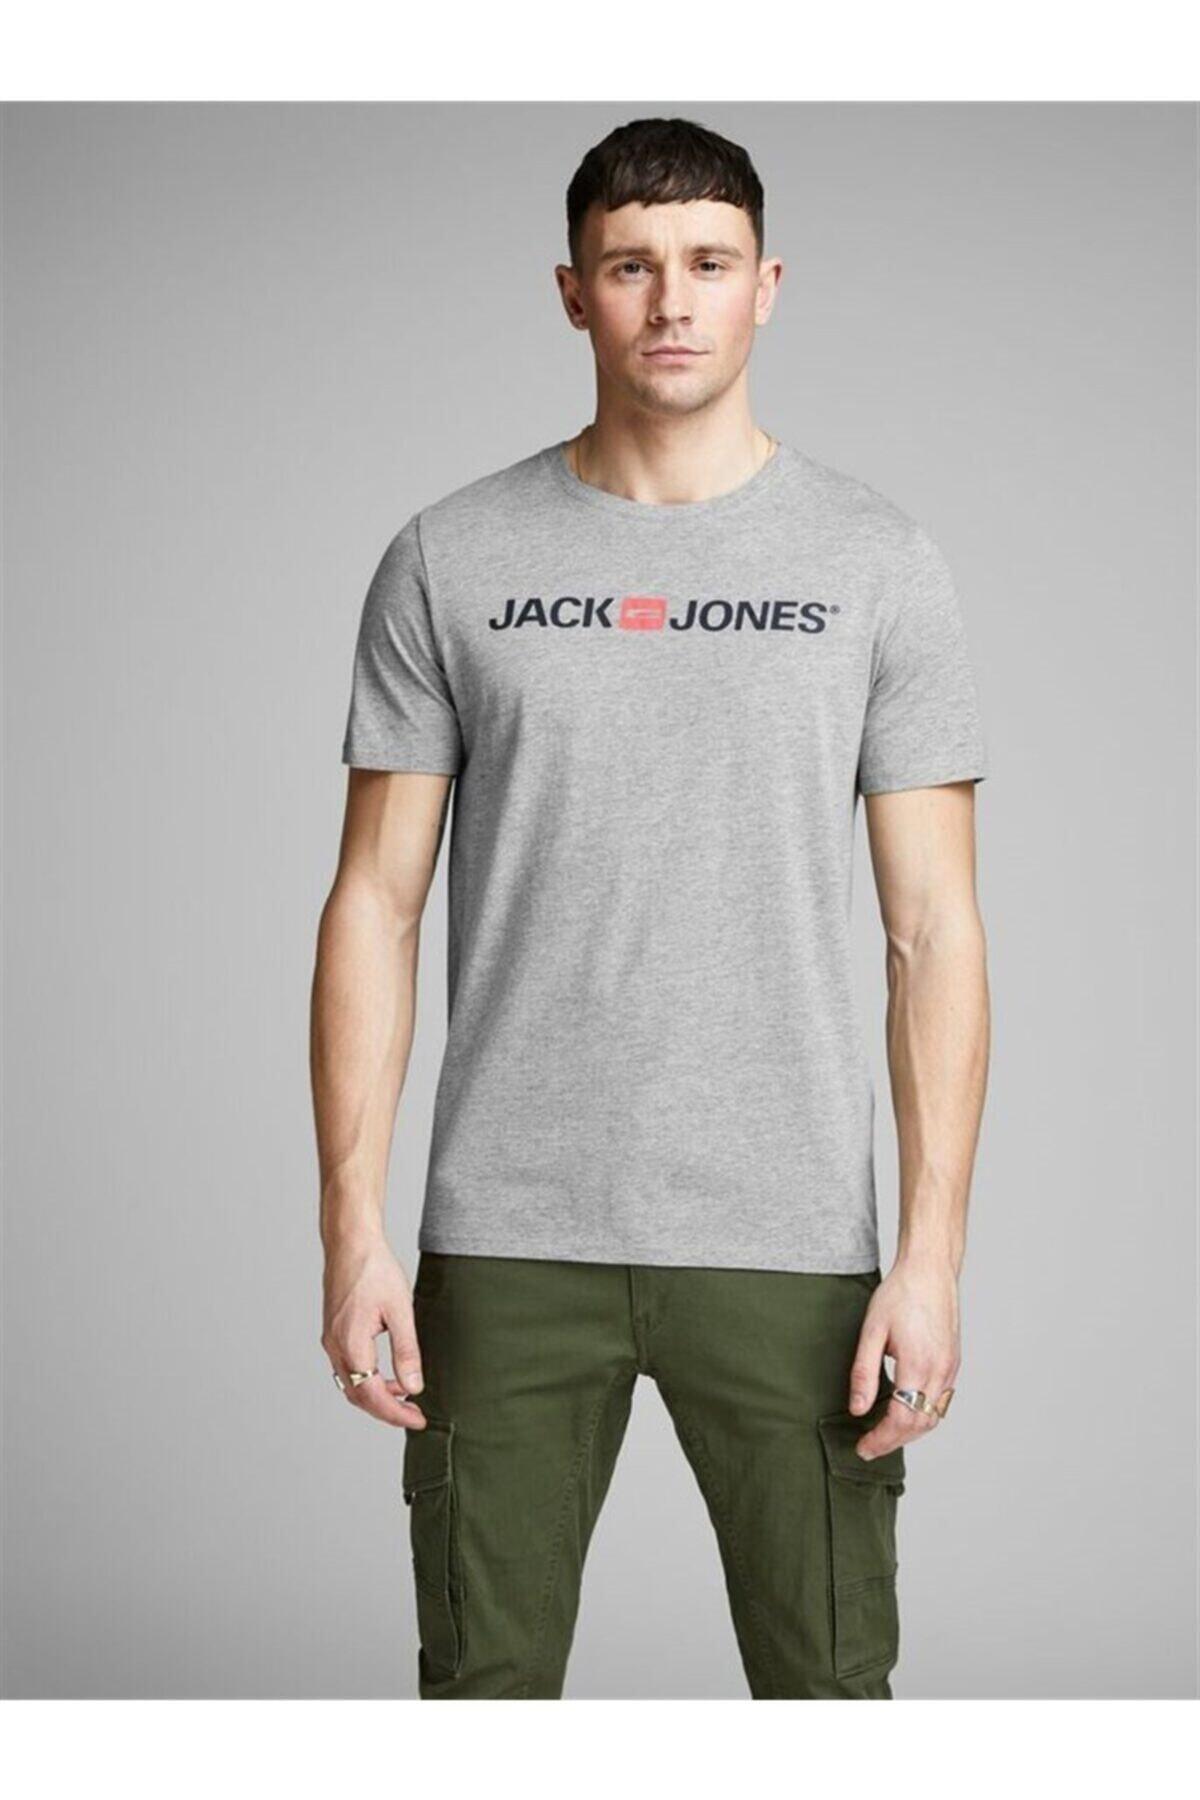 Jack & Jones Jack Jones Logo Crew Neck Noos Erkek Tshirt 12137126sg 1